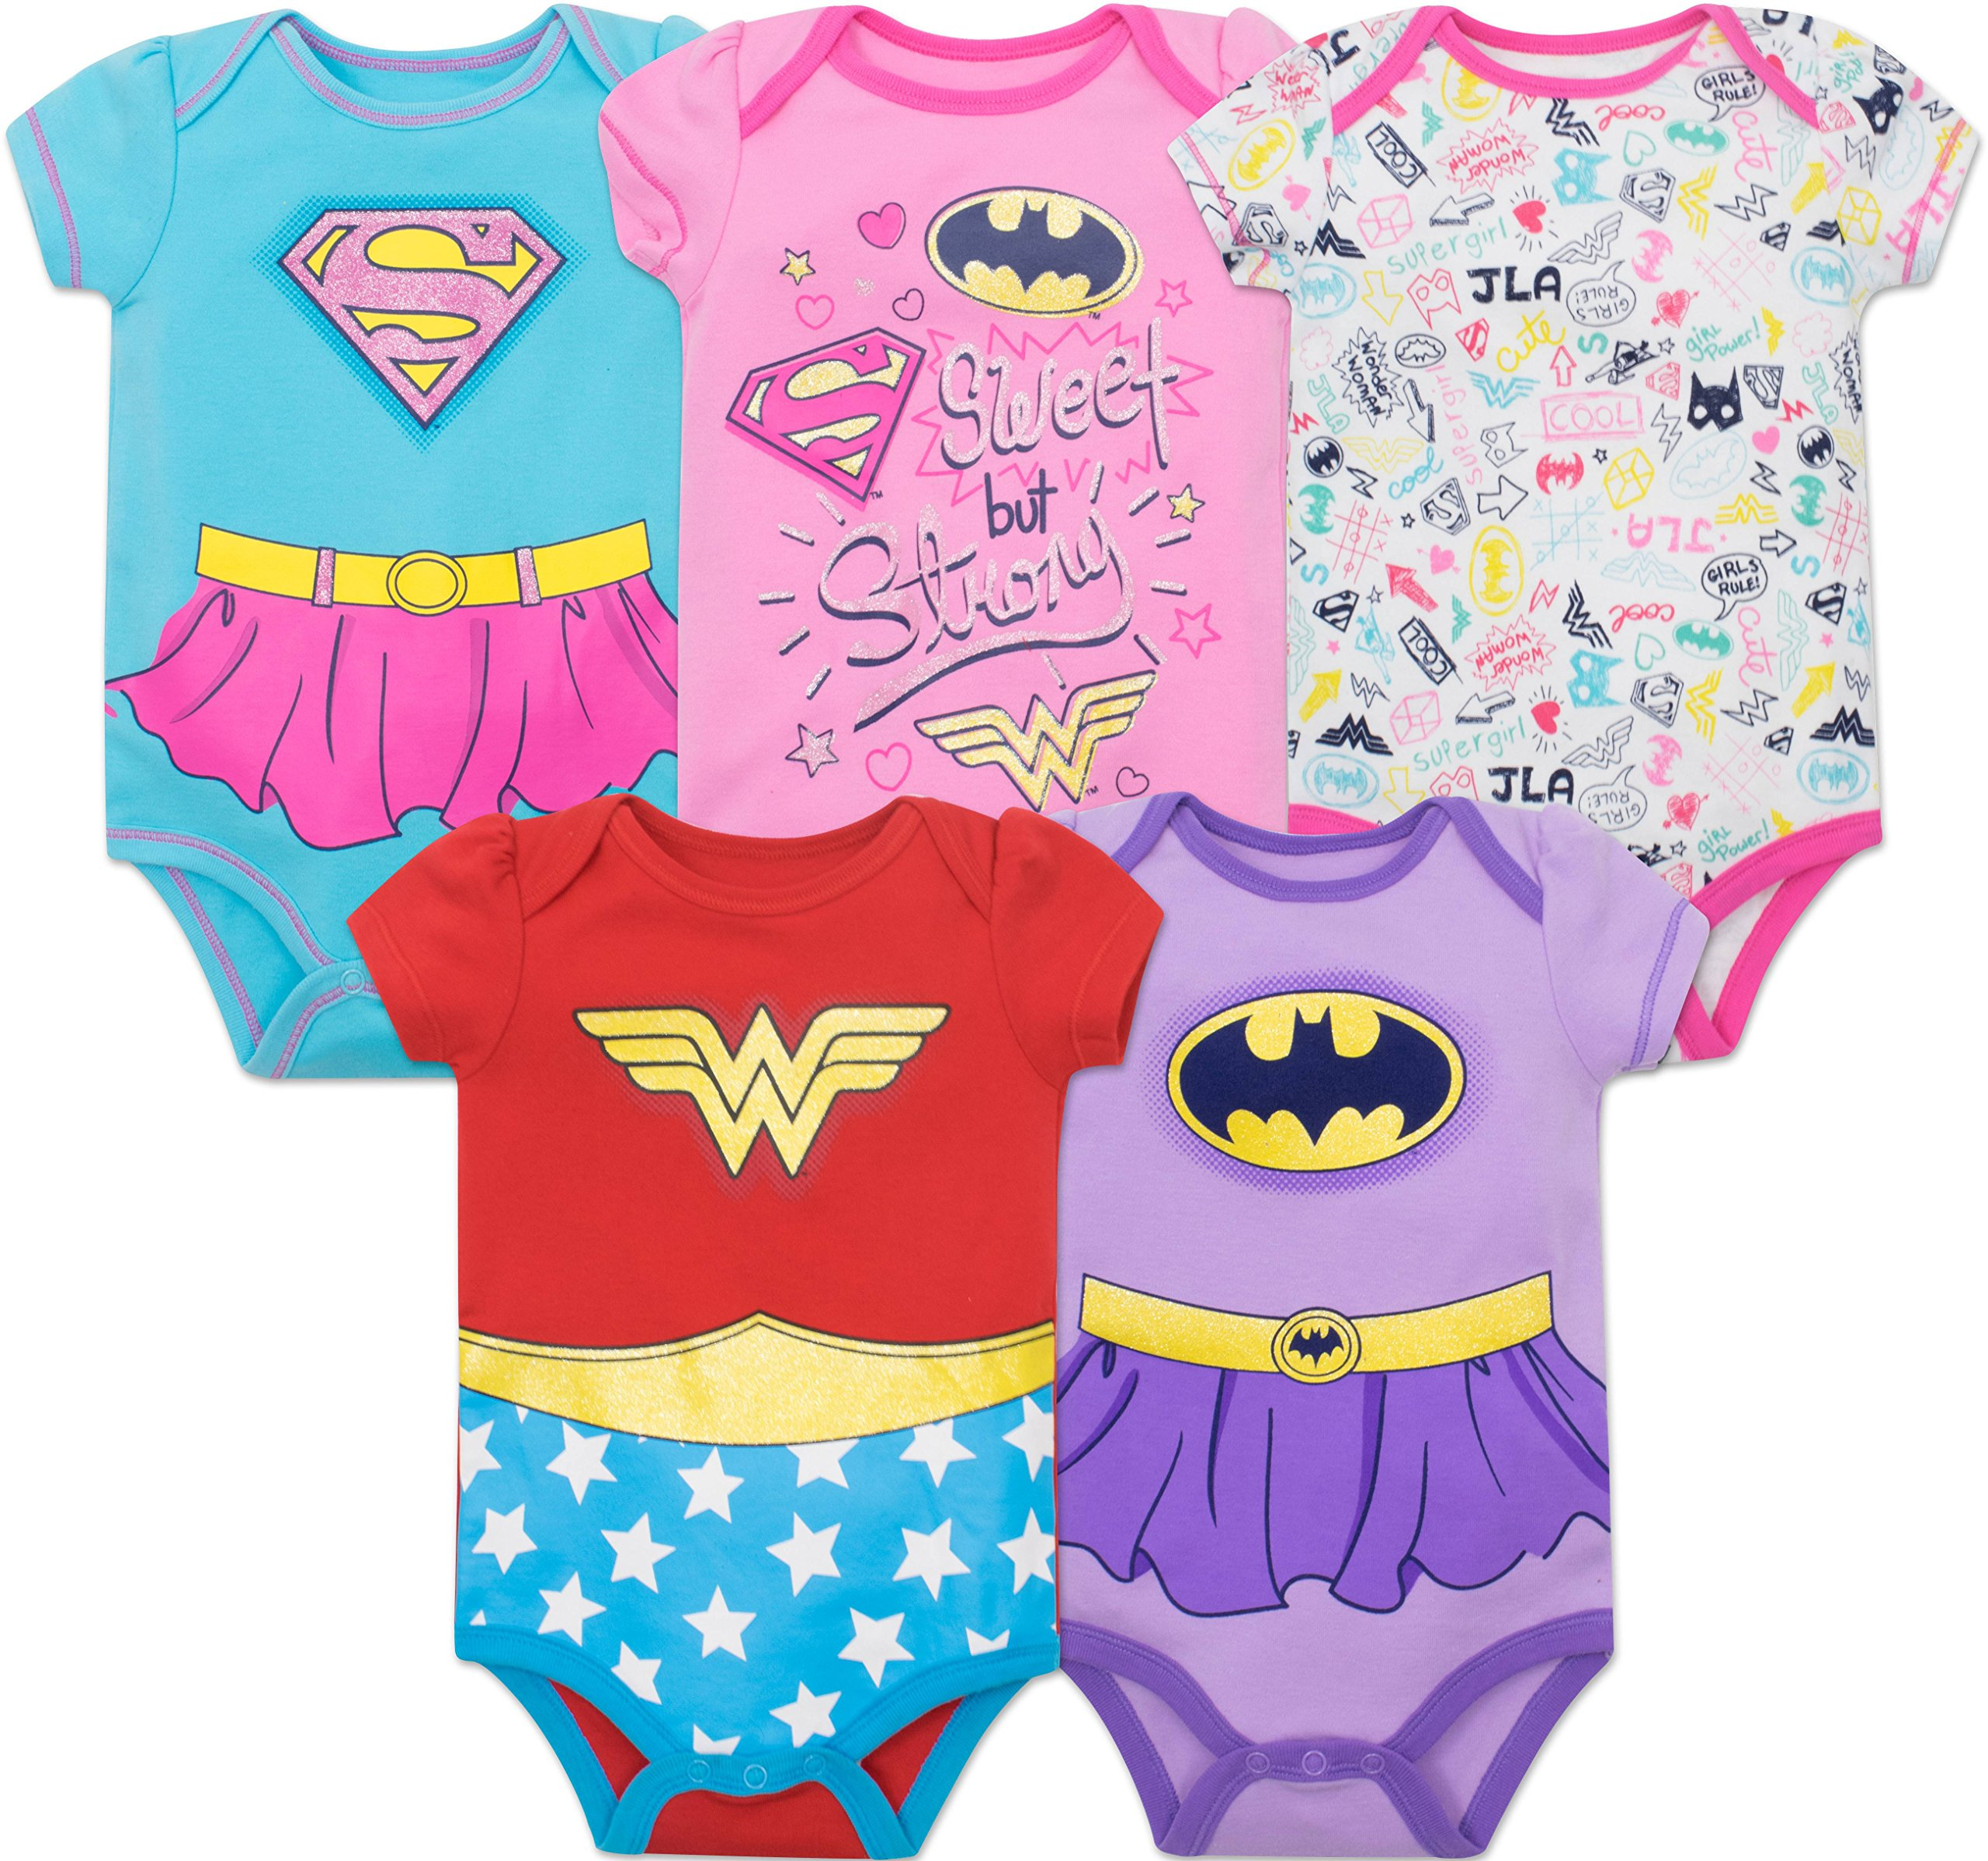 Justice League Baby Girls' 5 Pack Onesies - Wonder Woman, Batgirl and Supergirl (3-6M)